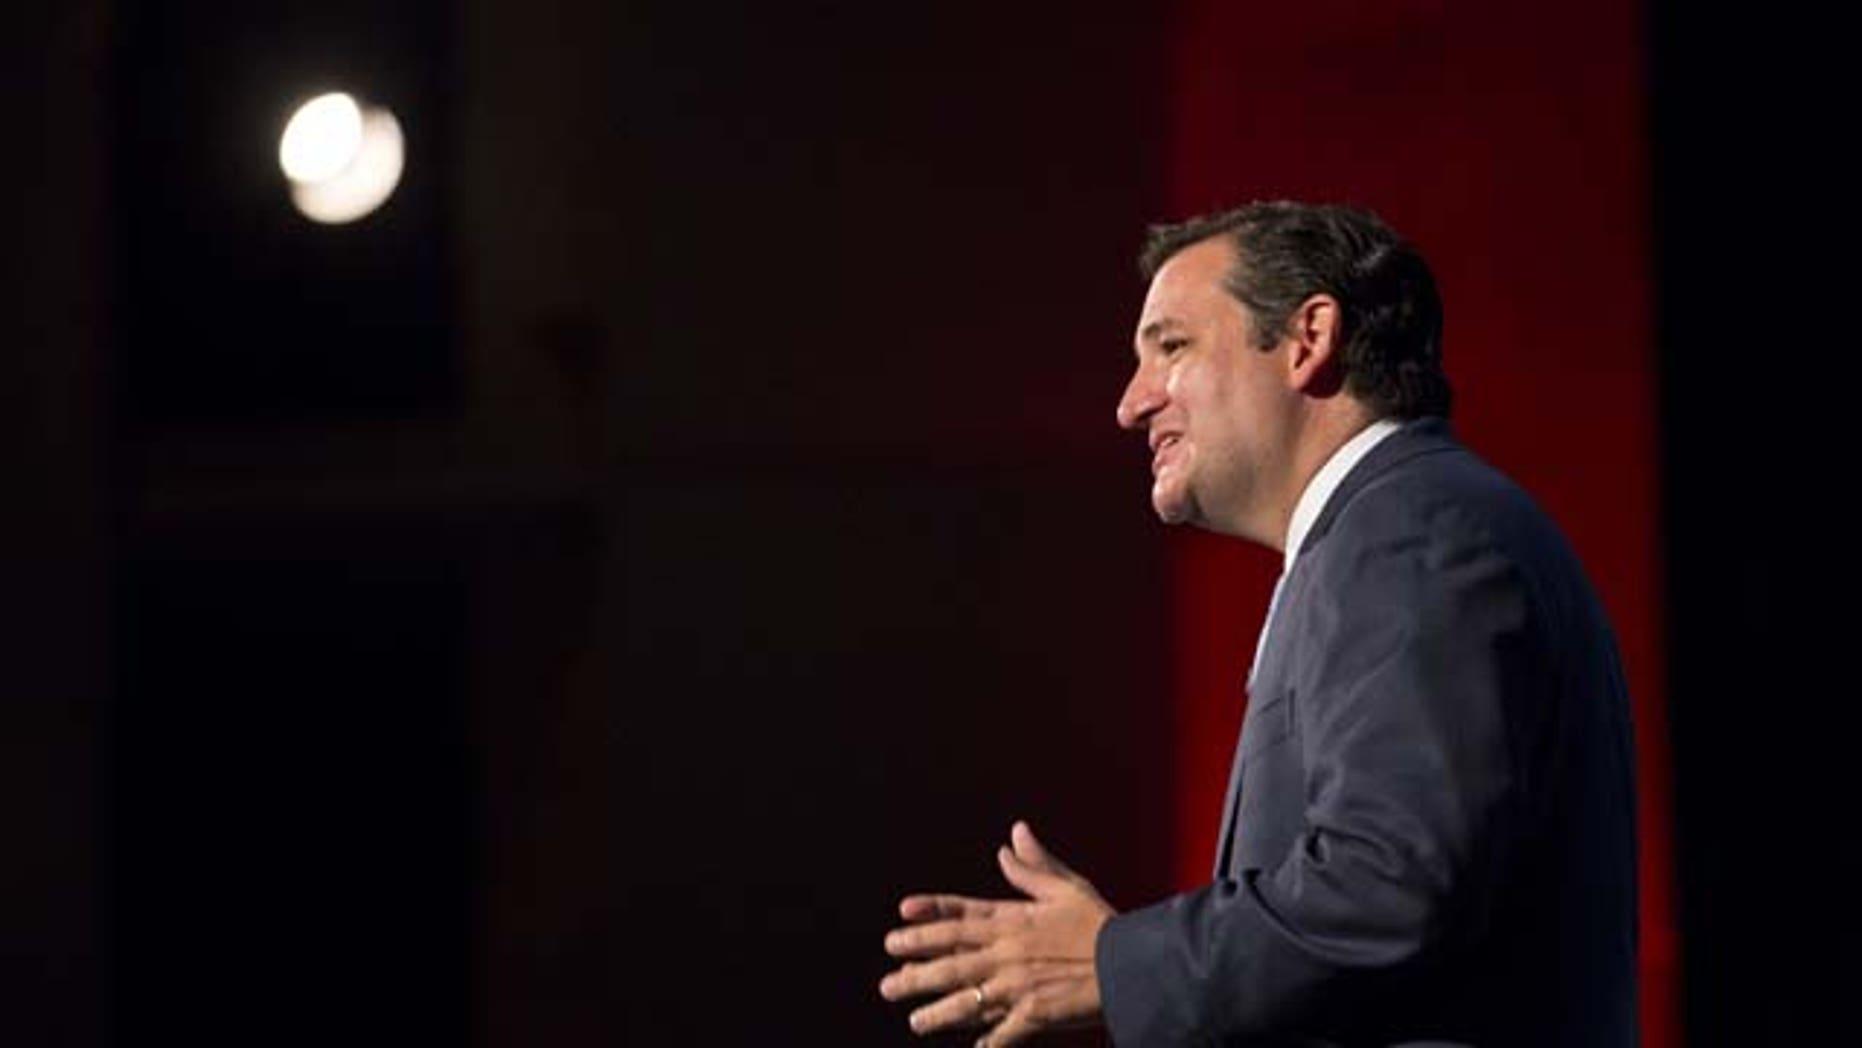 August 10, 2013: Sen. Ted Cruz, (R-Texas), speaks during the Family Leadership Summit in Ames, Iowa (AP Photo)